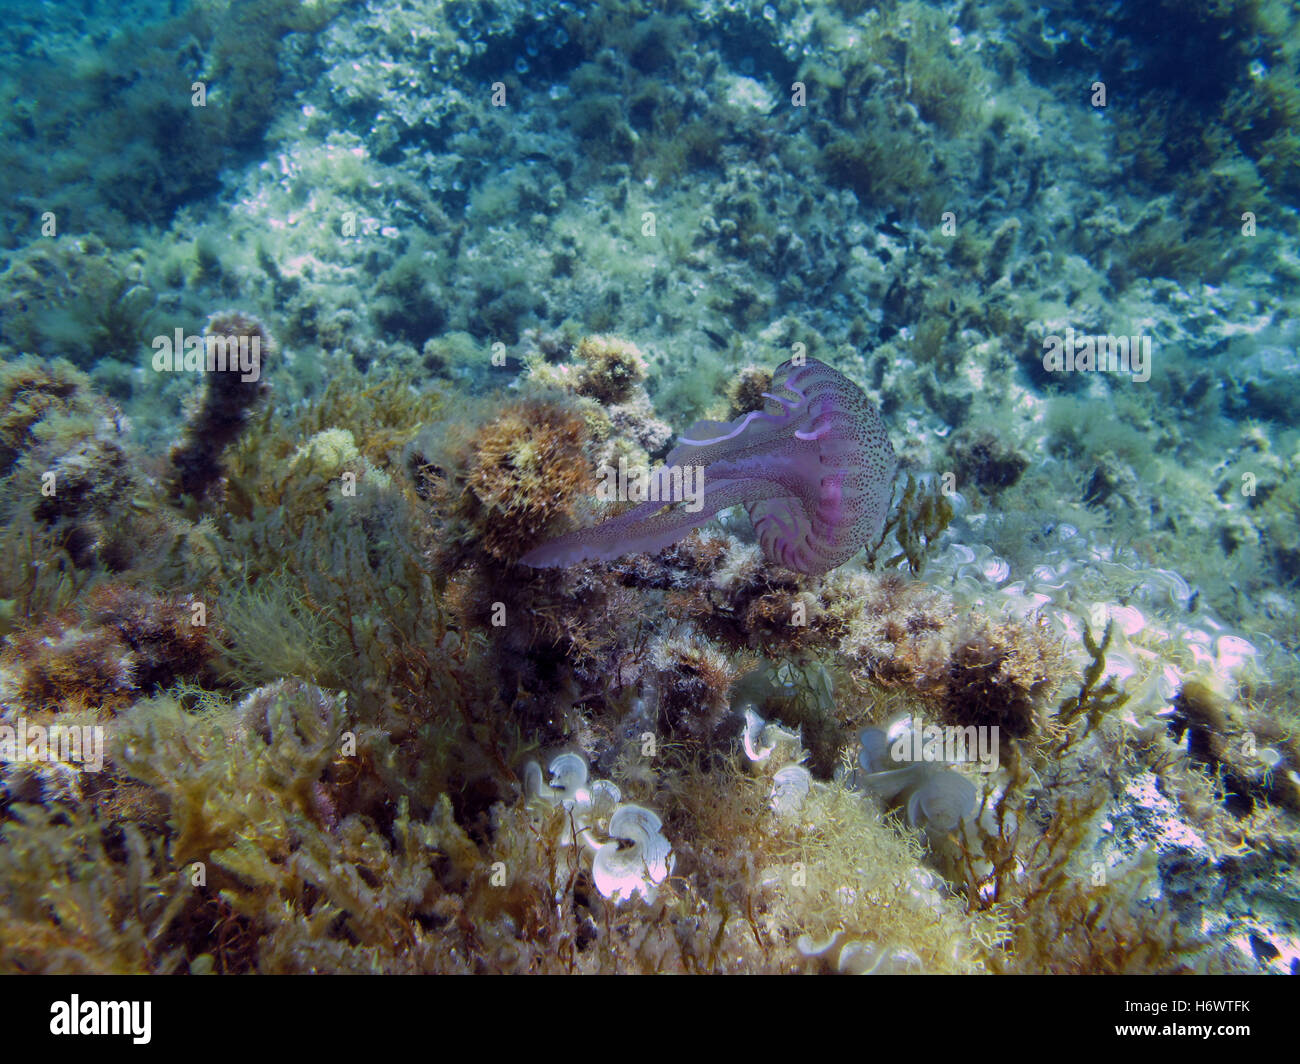 A Purple Stinger Jellyfish on a Mediterranean reef. Stock Photo